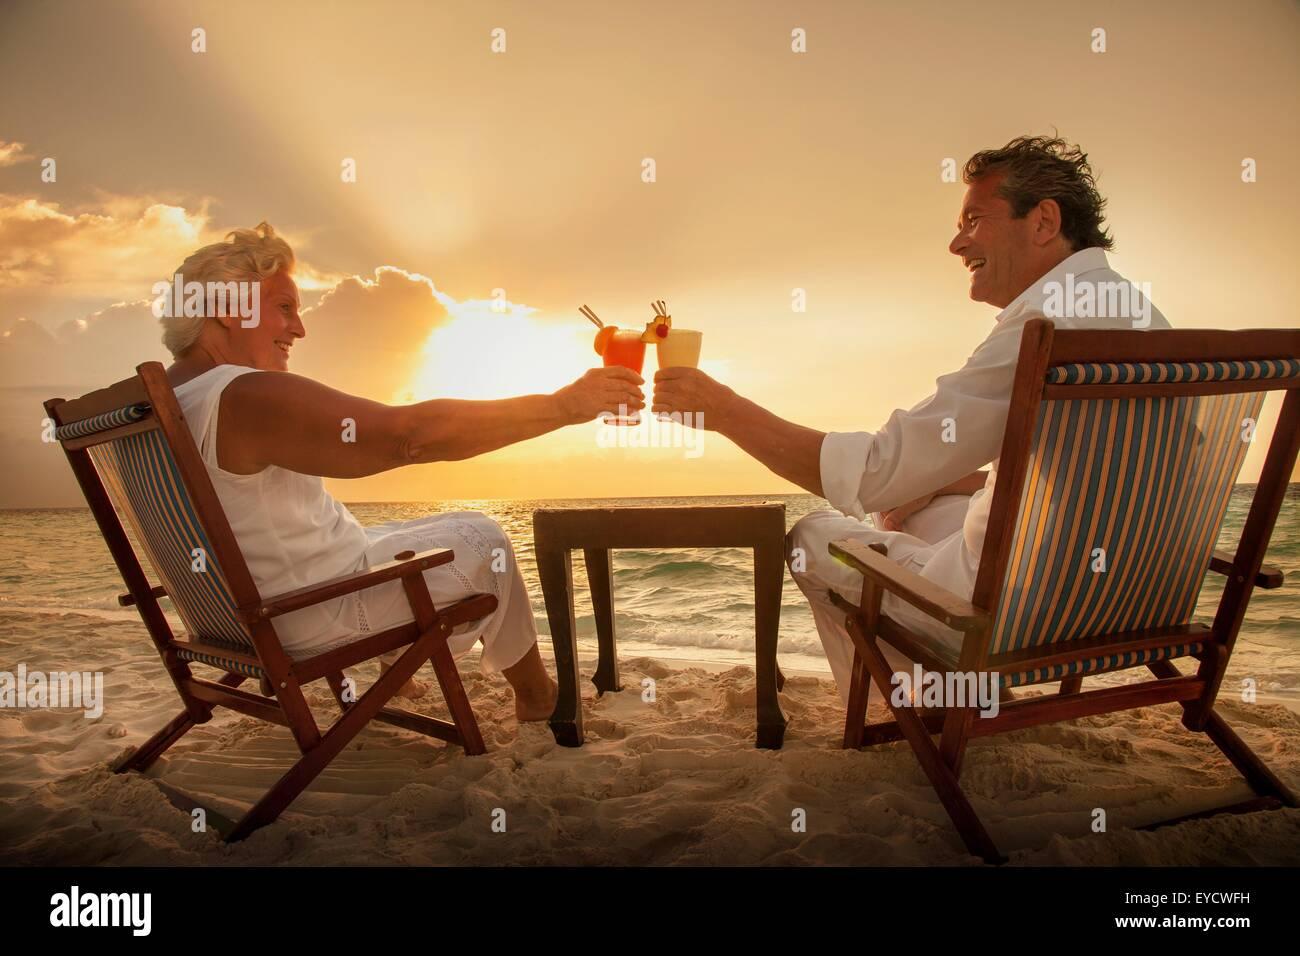 Senior couple toasting drinks on beach, Maldives - Stock Image